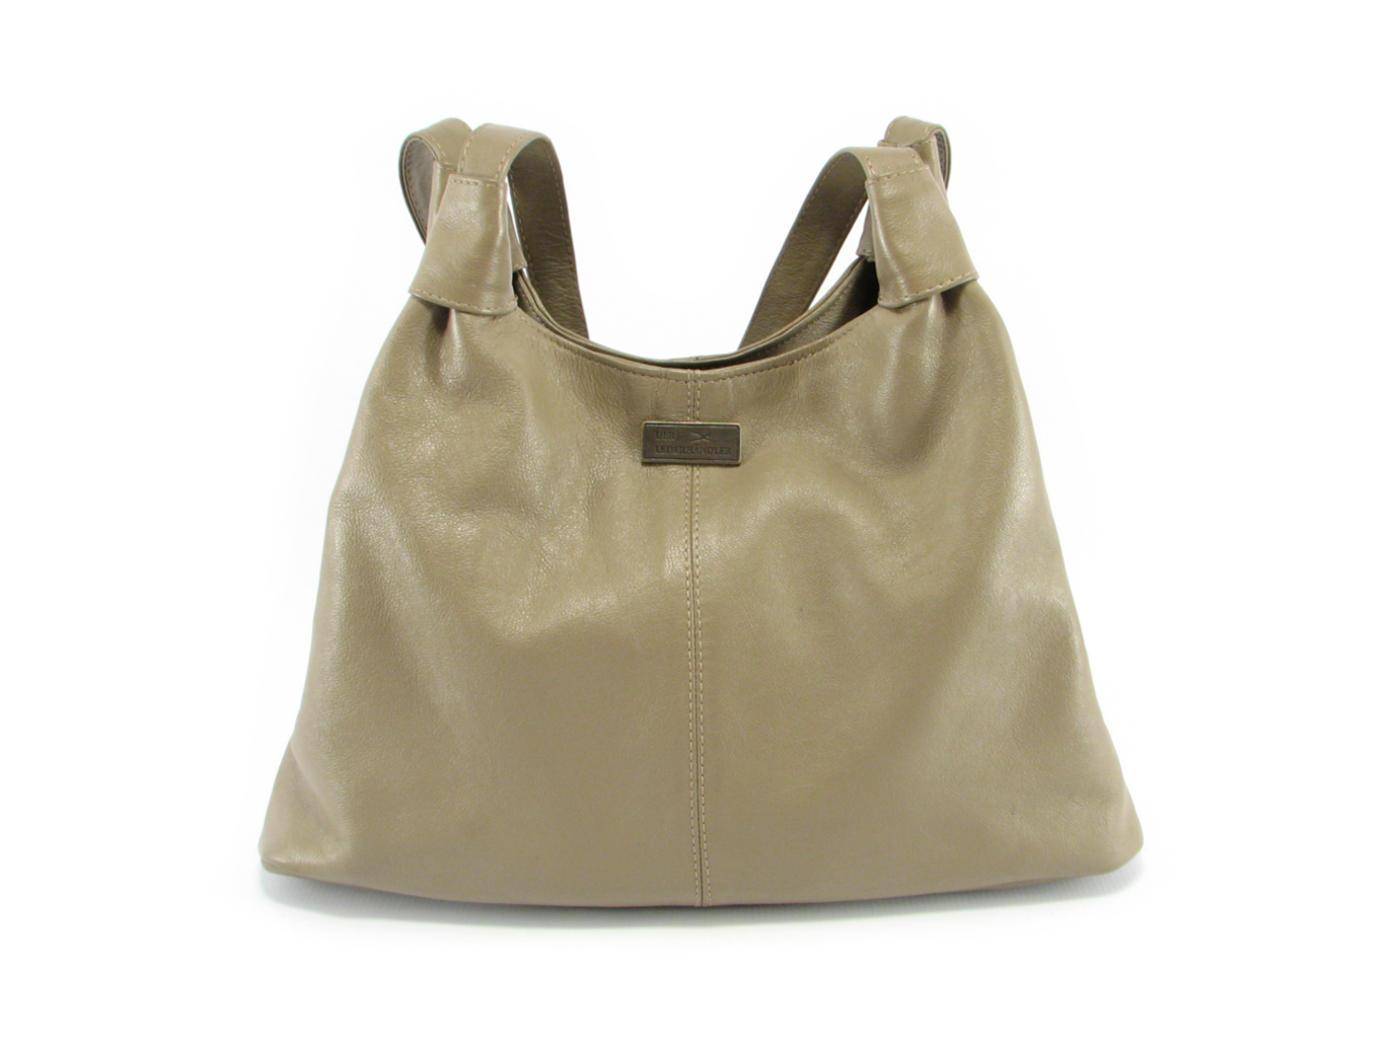 55f2de869b Ashleigh Plain Small HP7133 front classic handbag leather bags women